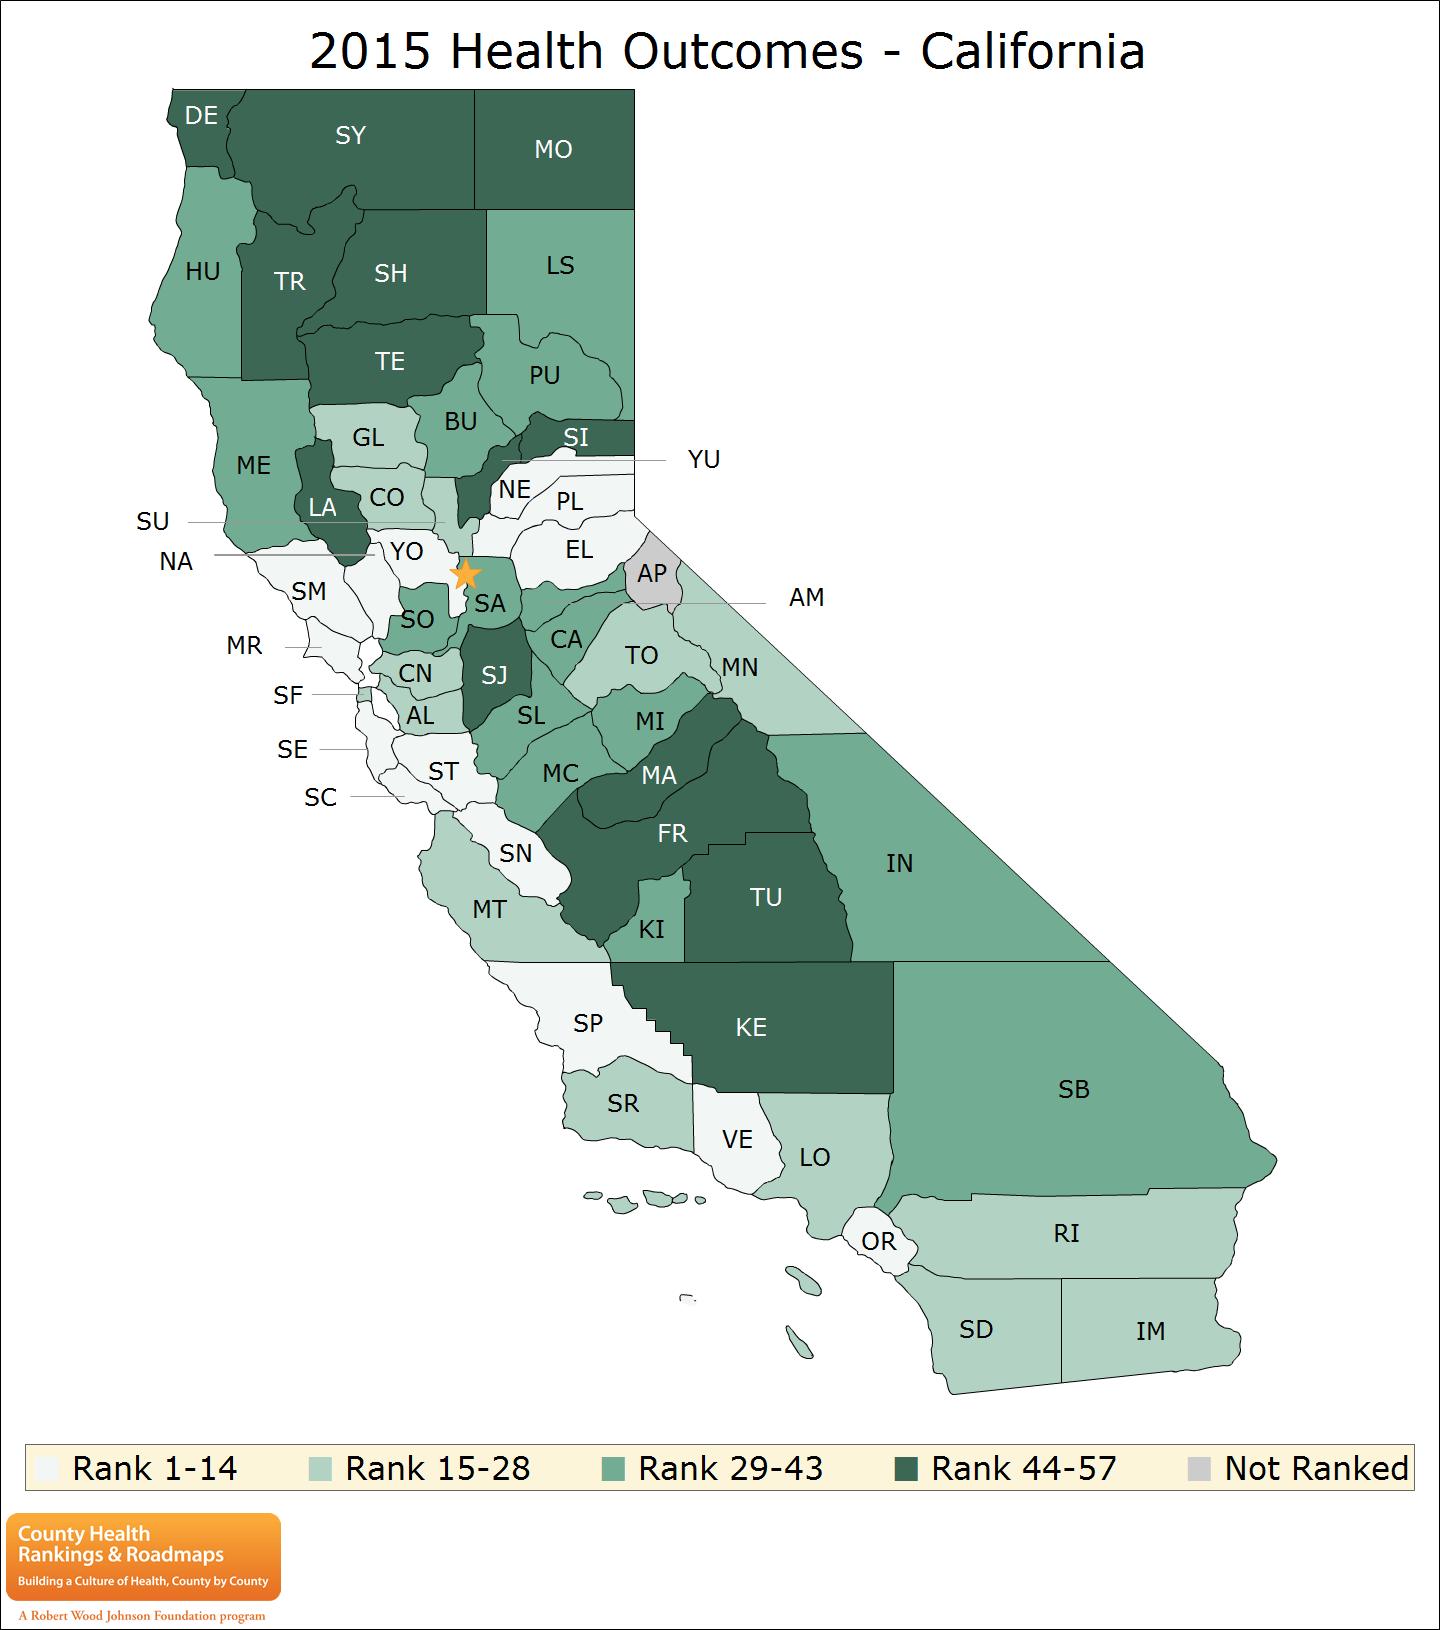 California Rankings Data | County Health Rankings & Roadmaps